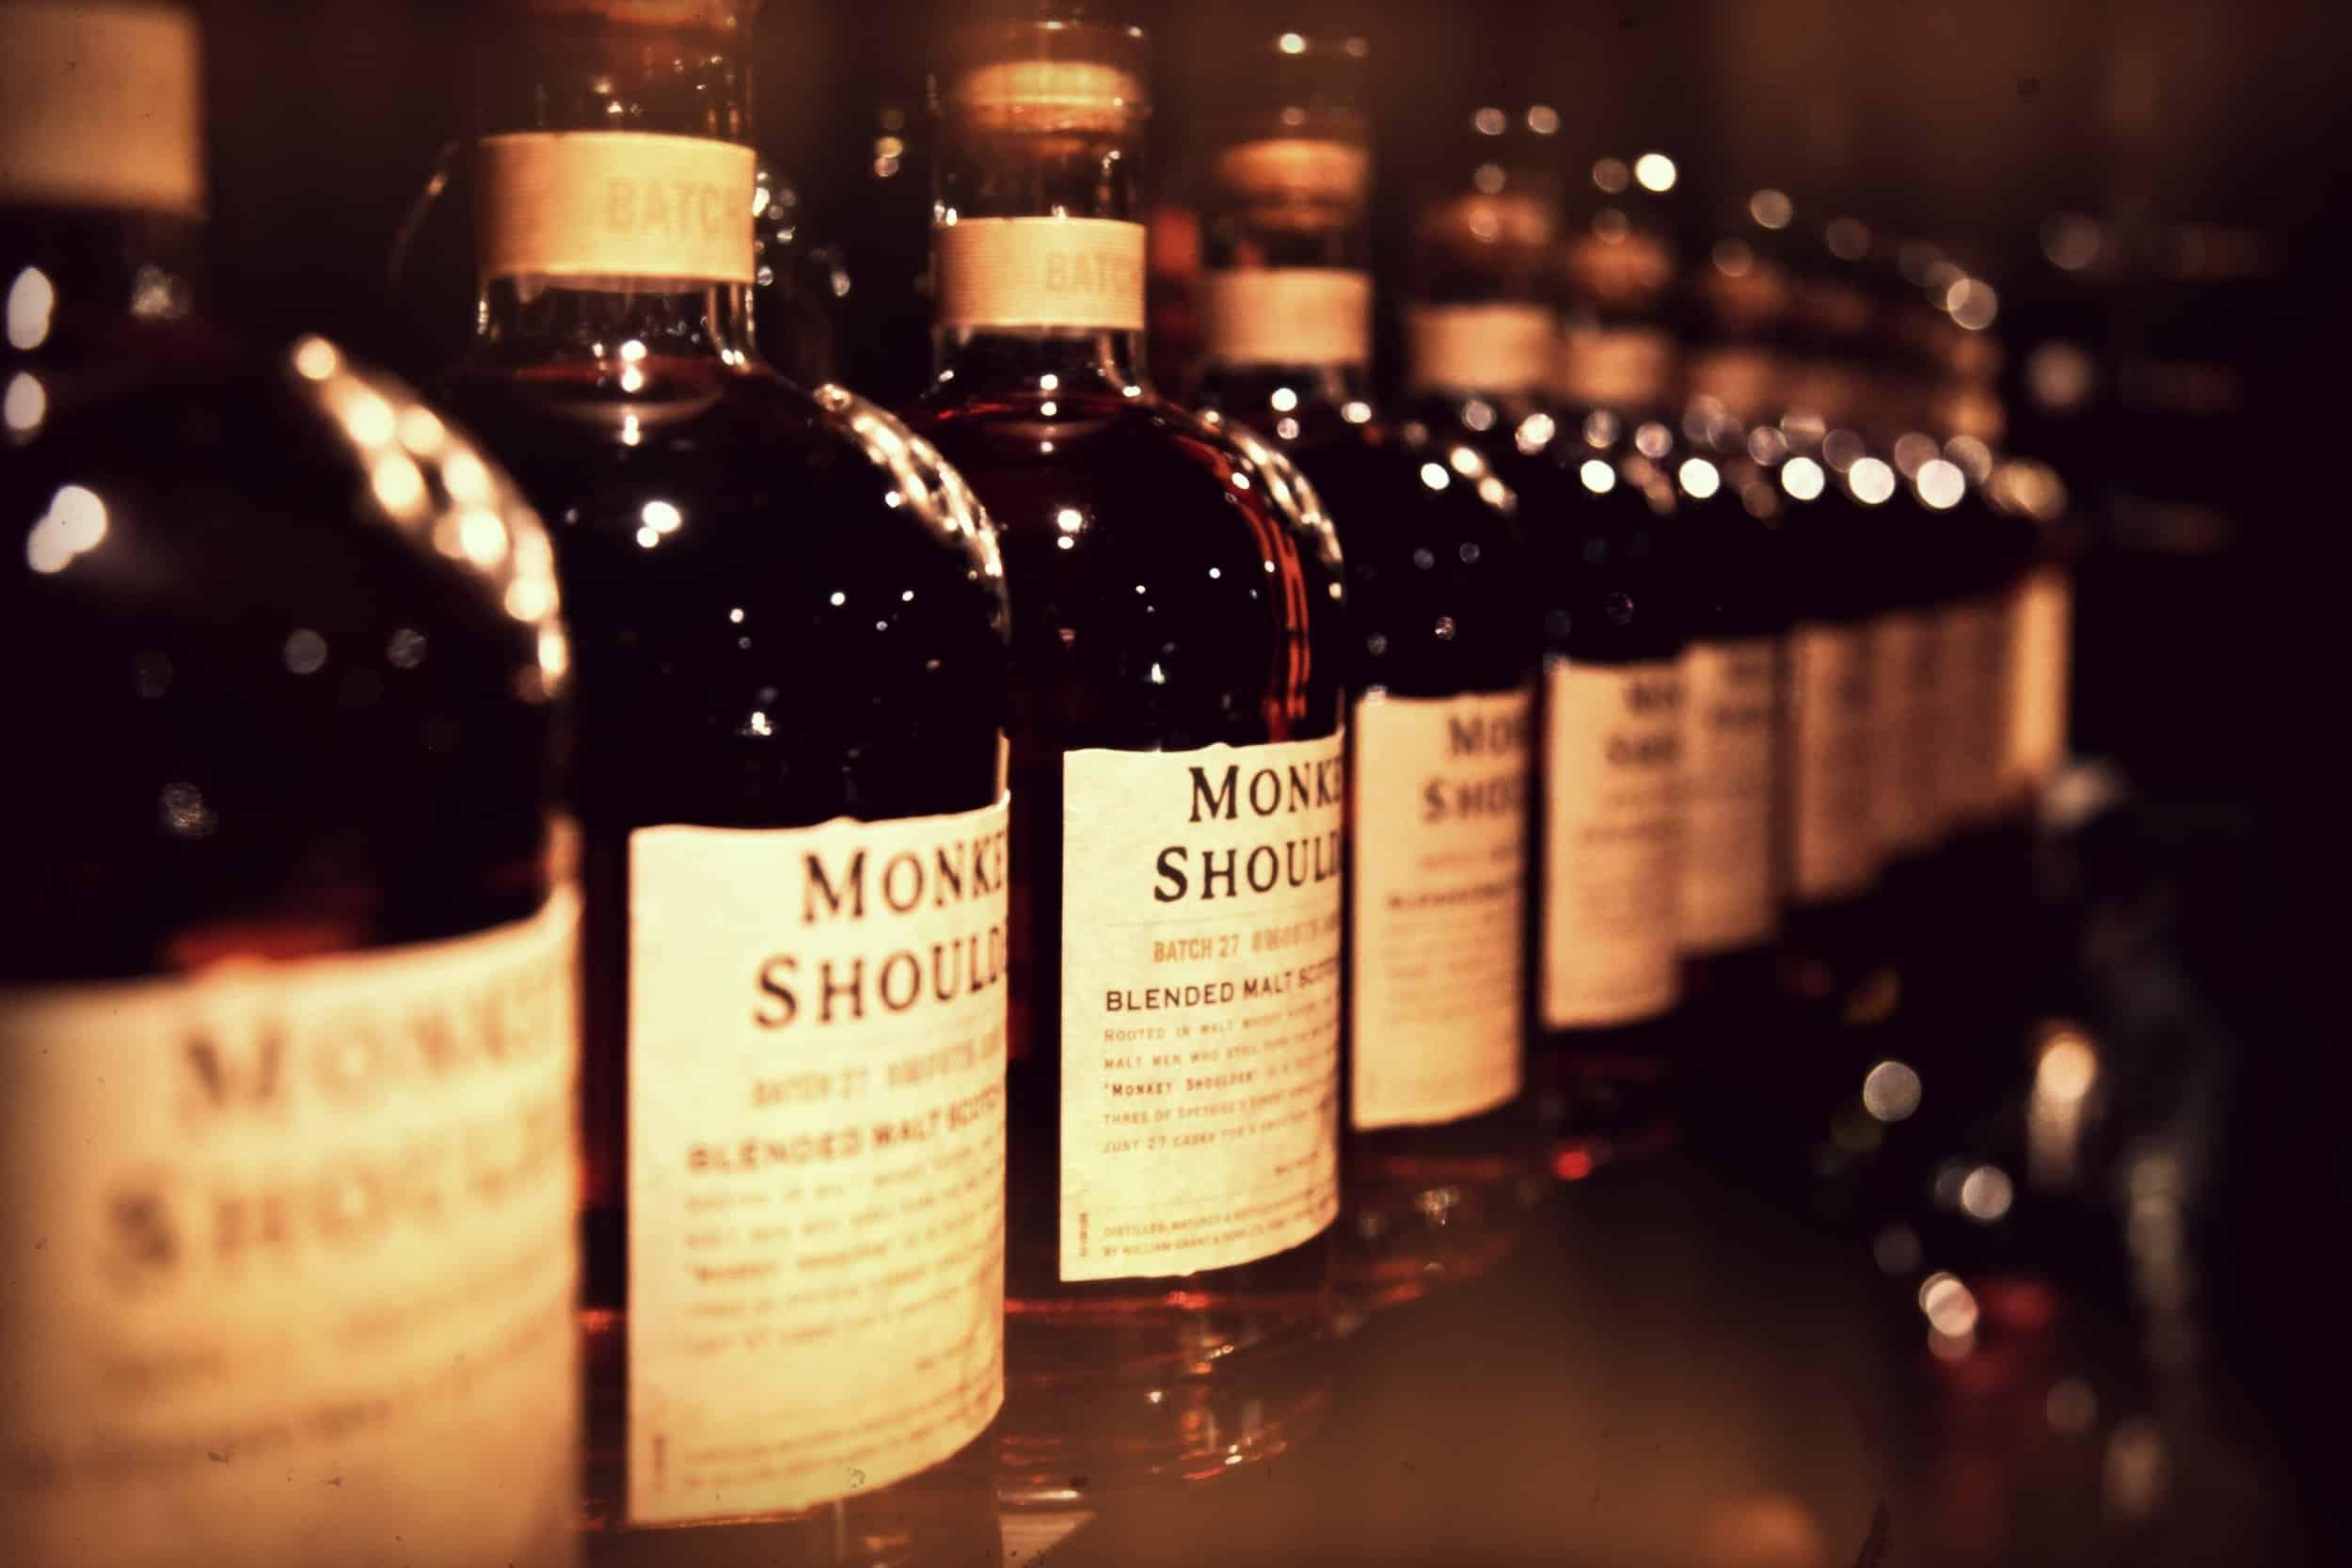 Monkey Shoulder – scotch under 50